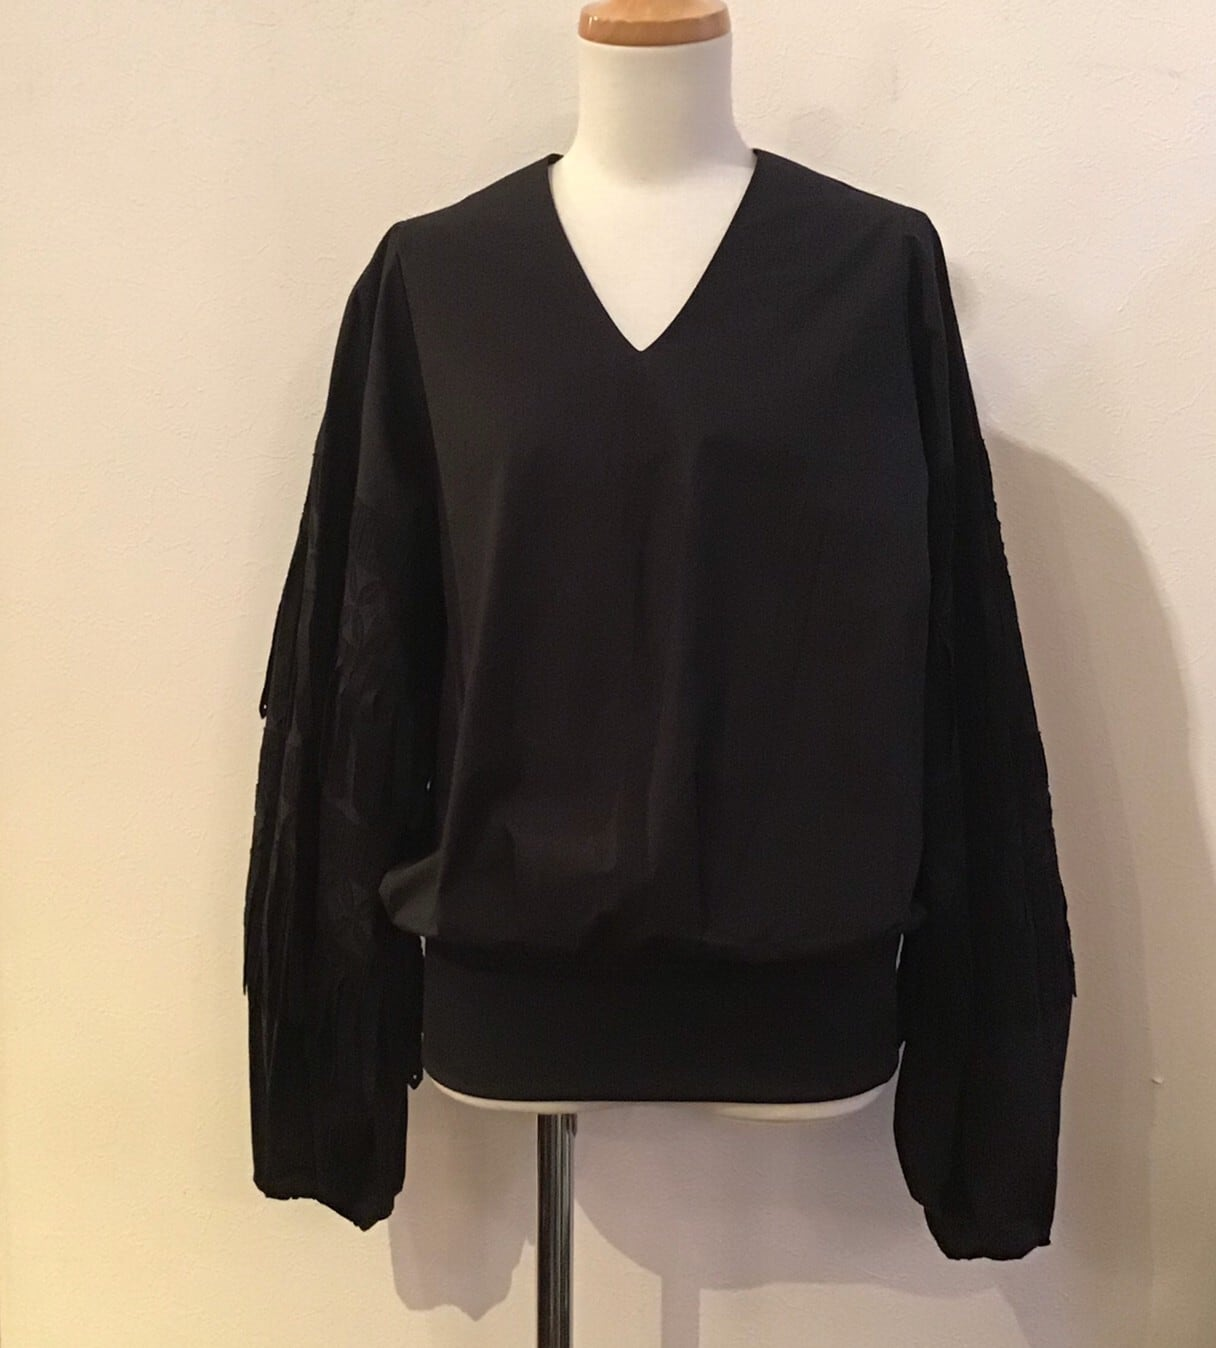 FUMIETANAKA F20A-20 arm fringe shirts color black size 36